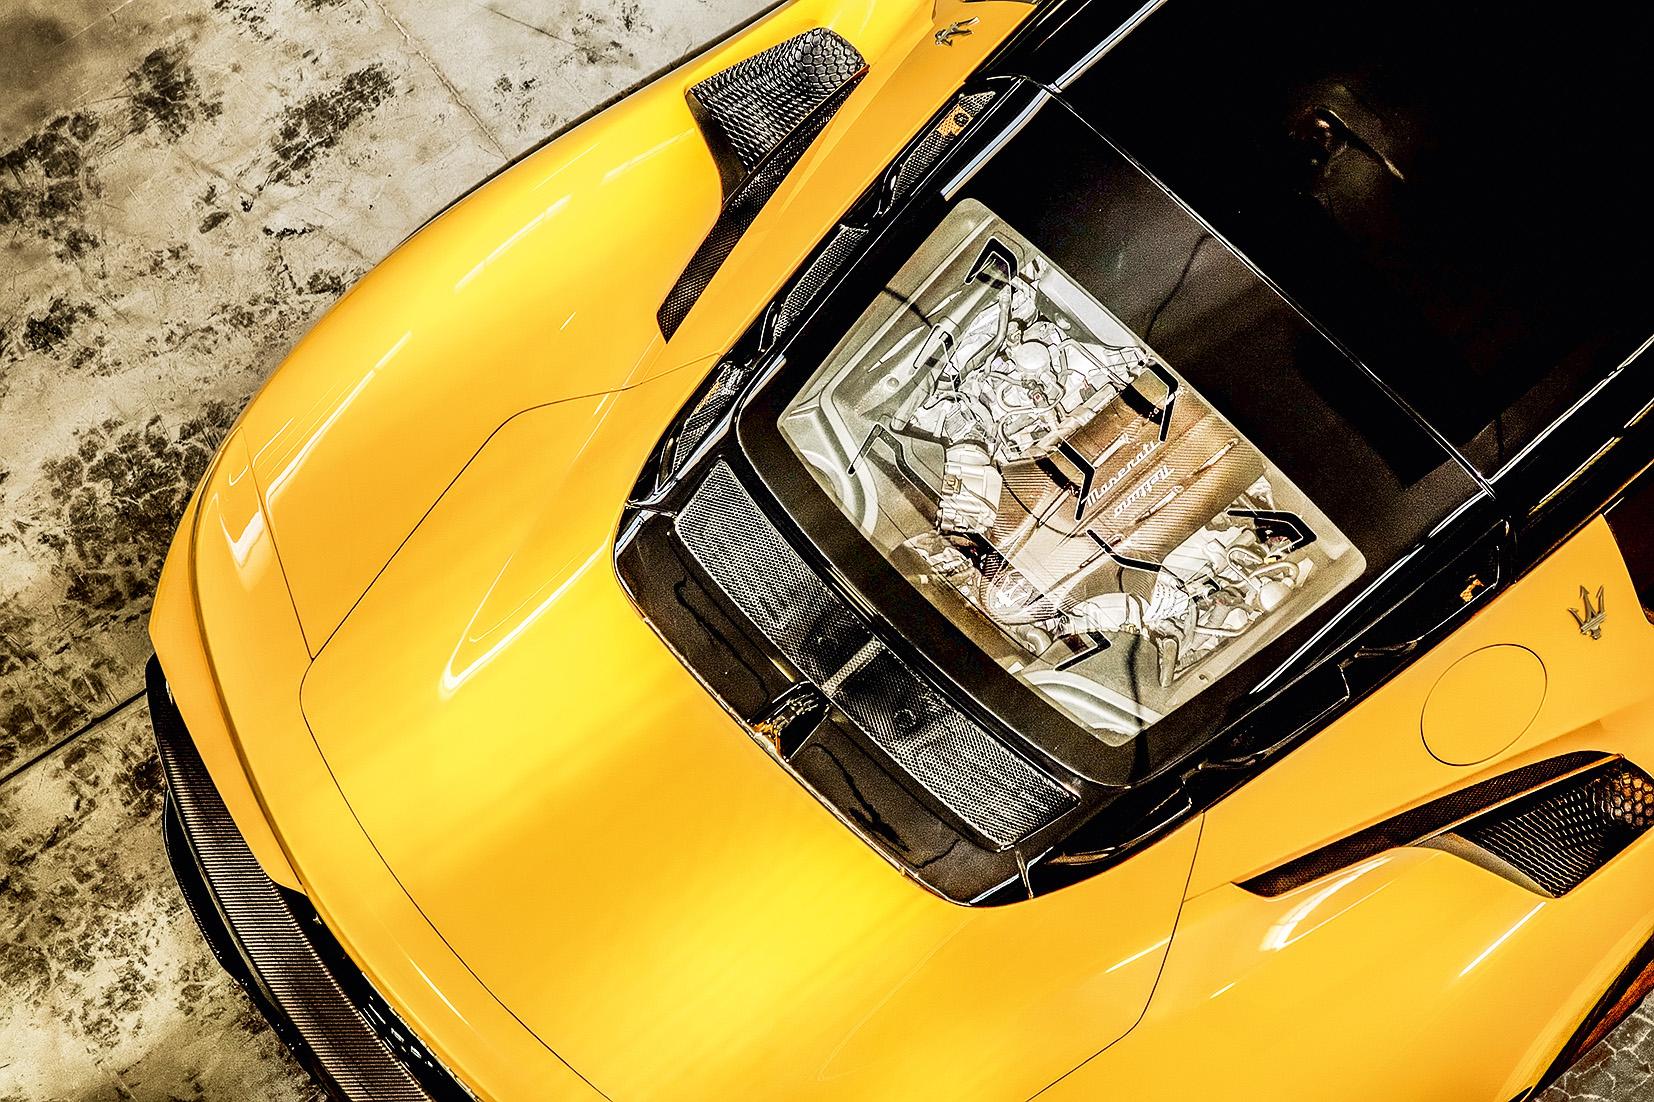 Motor da Maserati MC20 amarela visto de cima